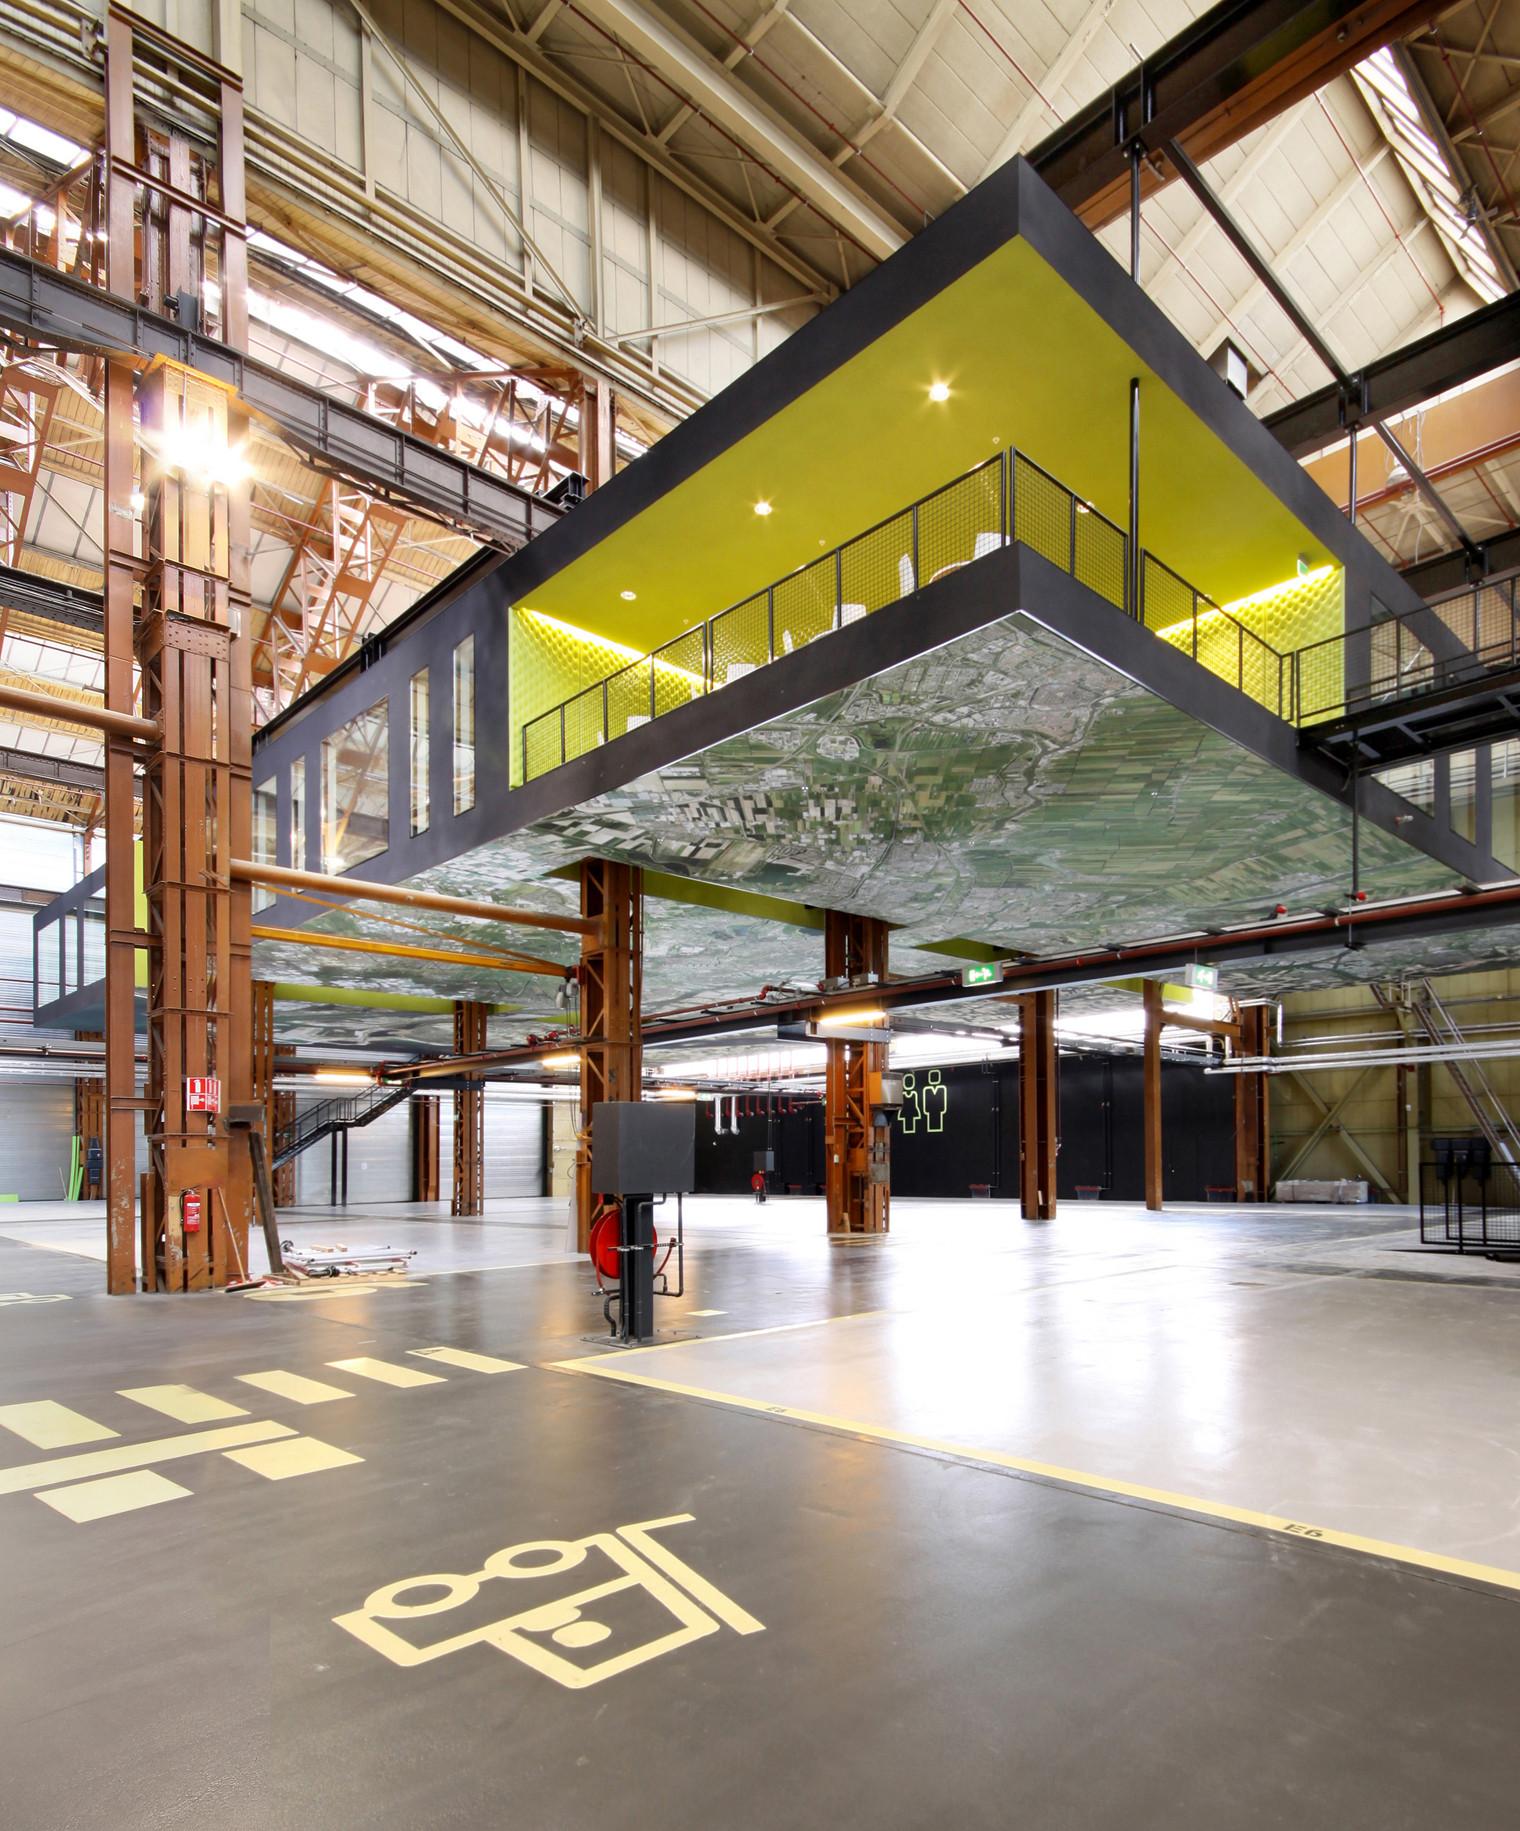 RDM Innovation Dock / Groosman, © Theo Peekstok